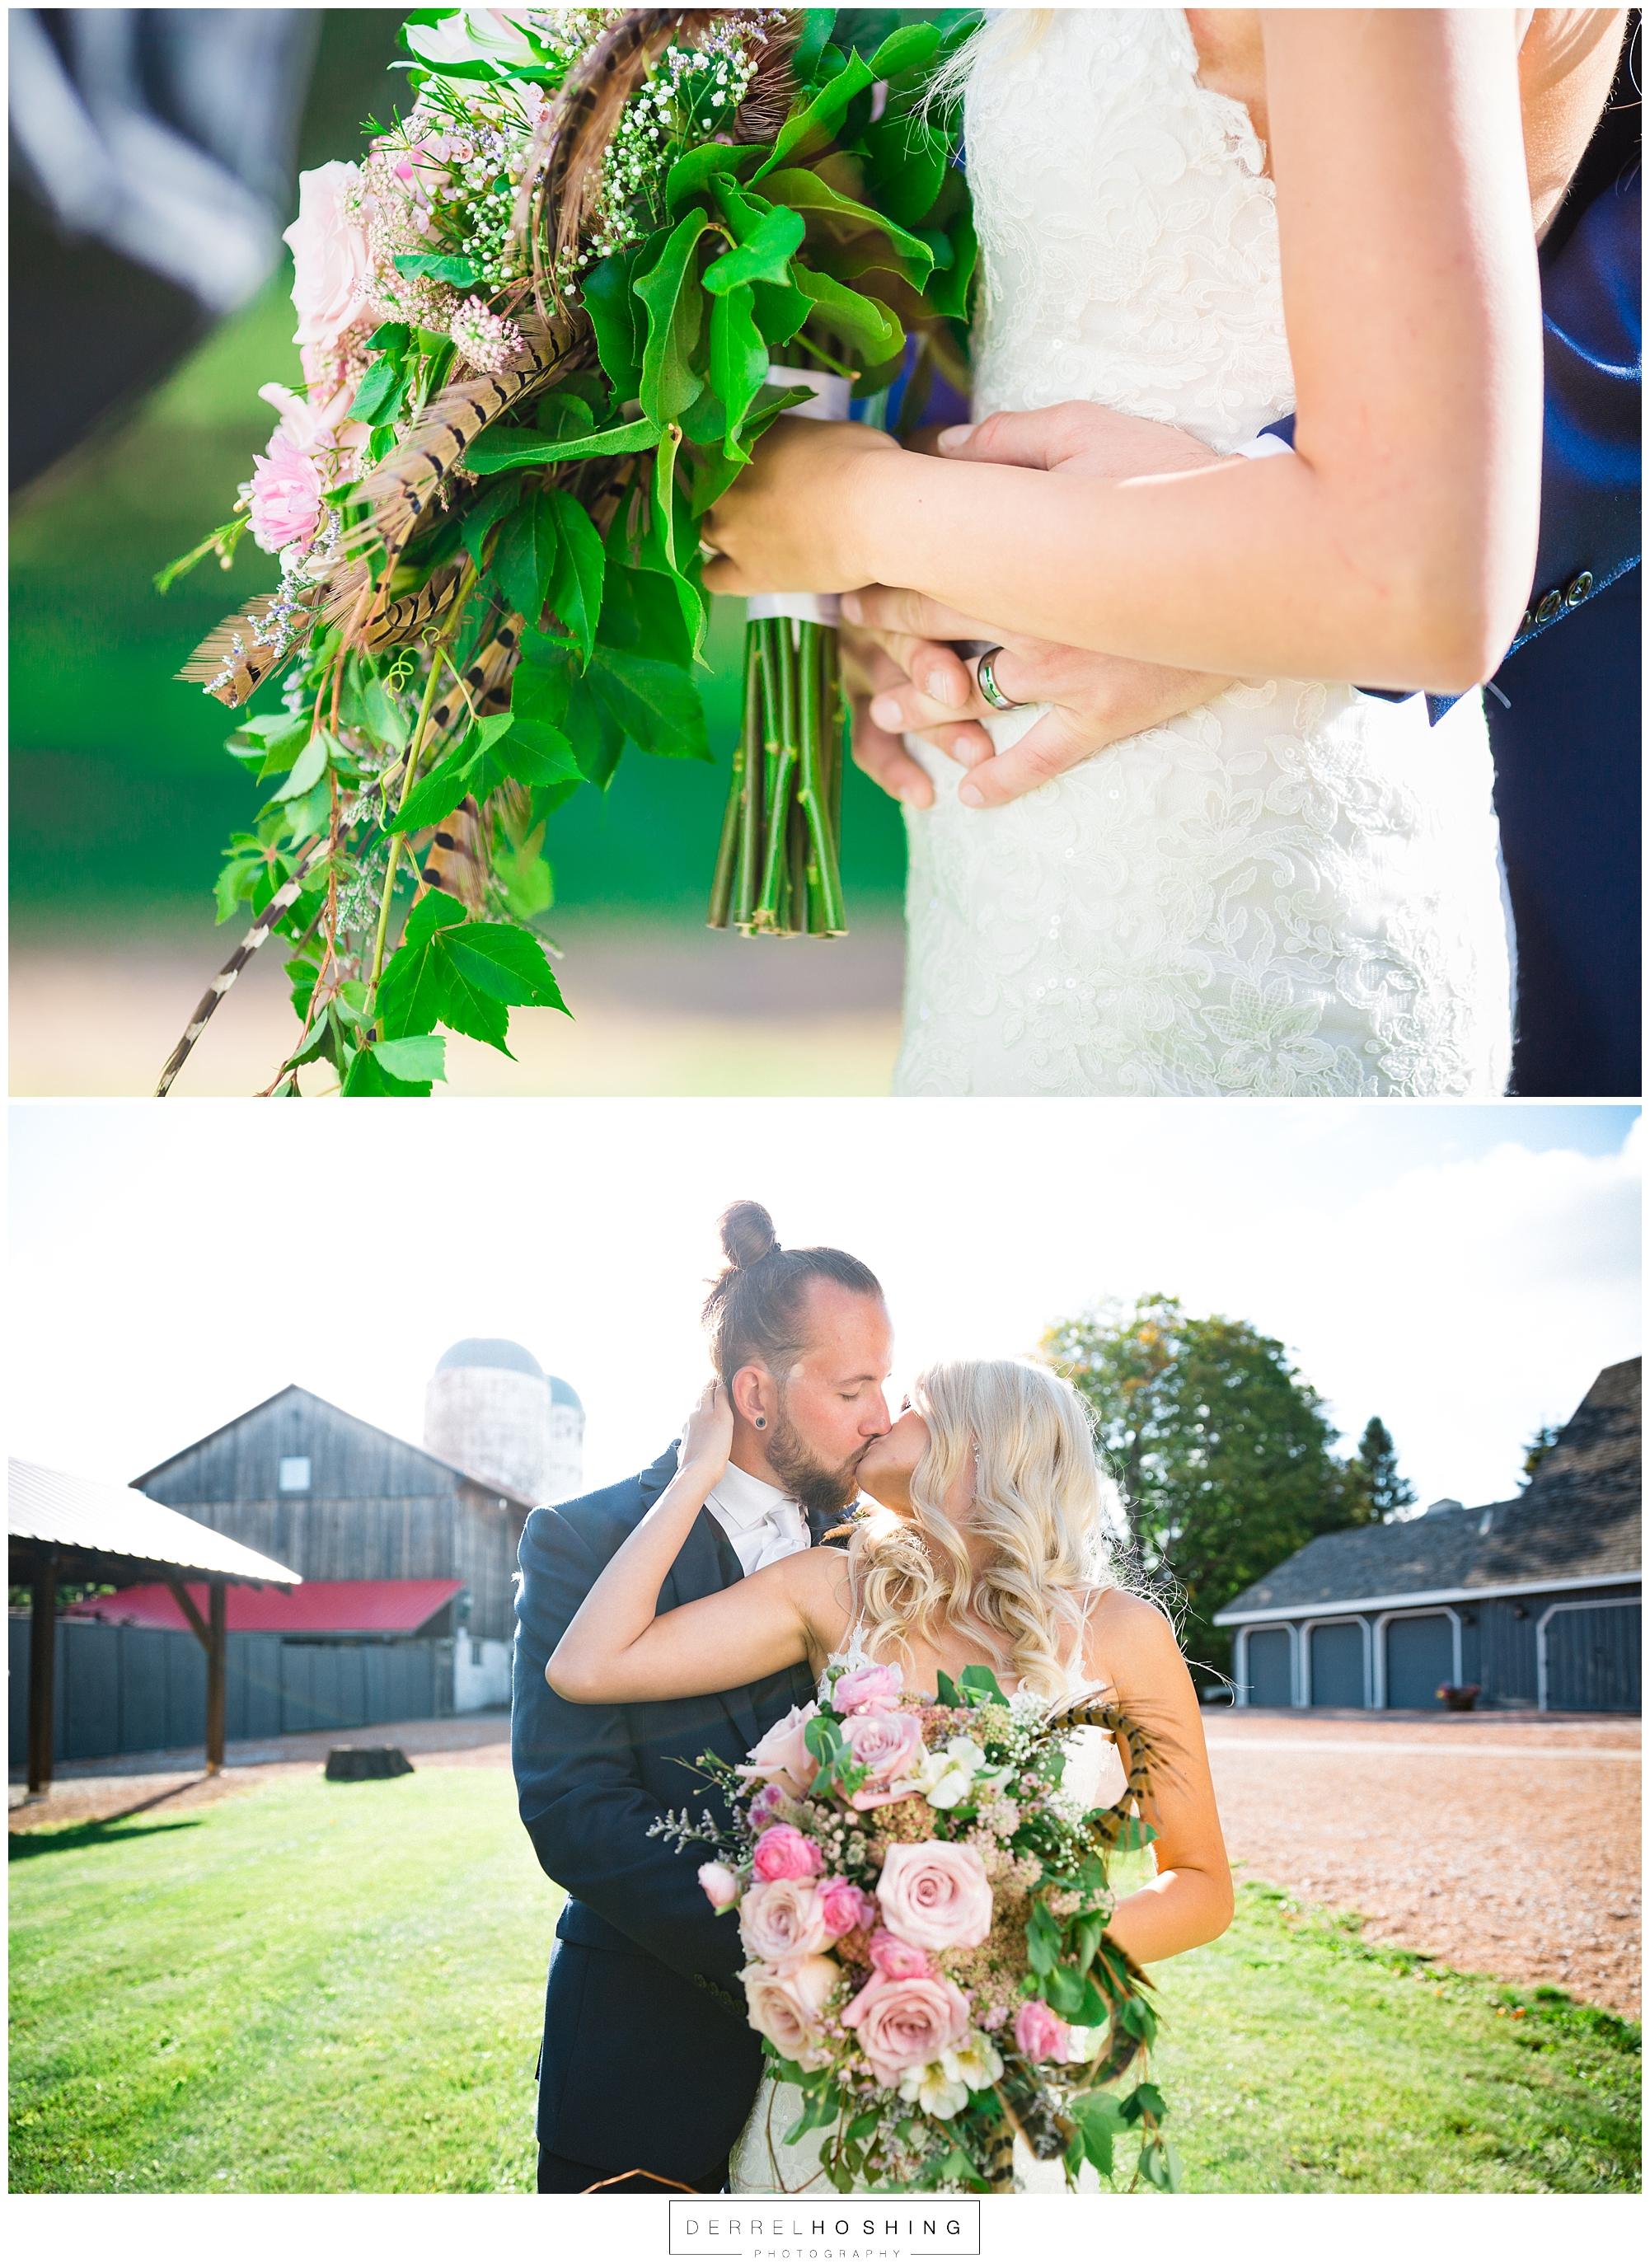 Belcroft-Estates-&-Event-Centre-Wedding-Innisfil-Ontario-0022.jpg